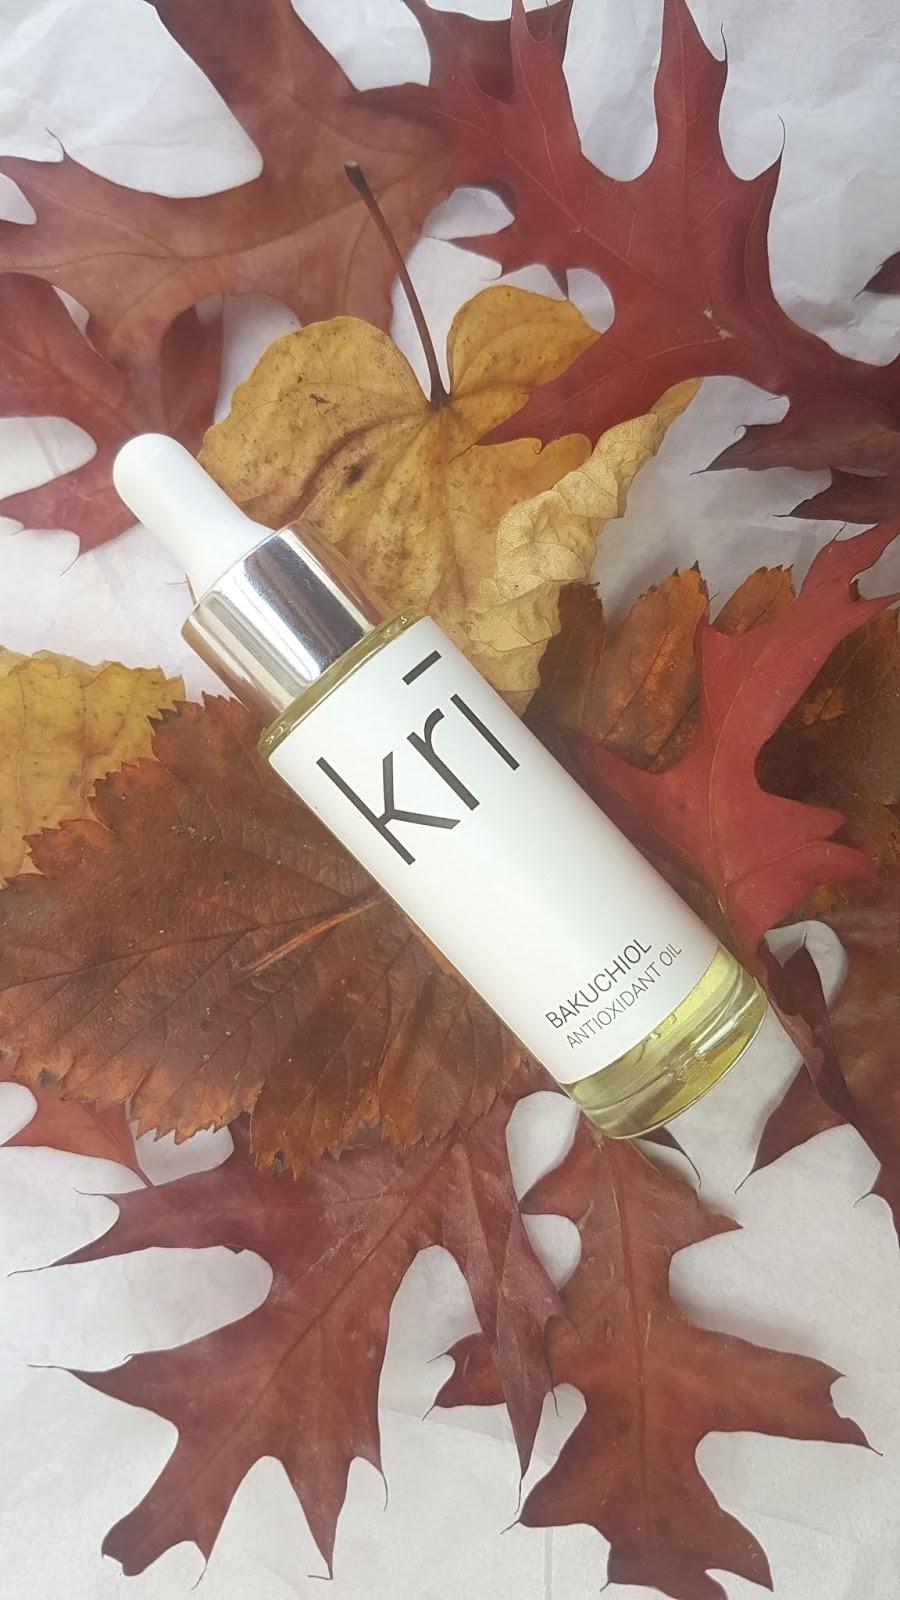 Kri Skincare Review - Bakuchiol Antioxidant Oil